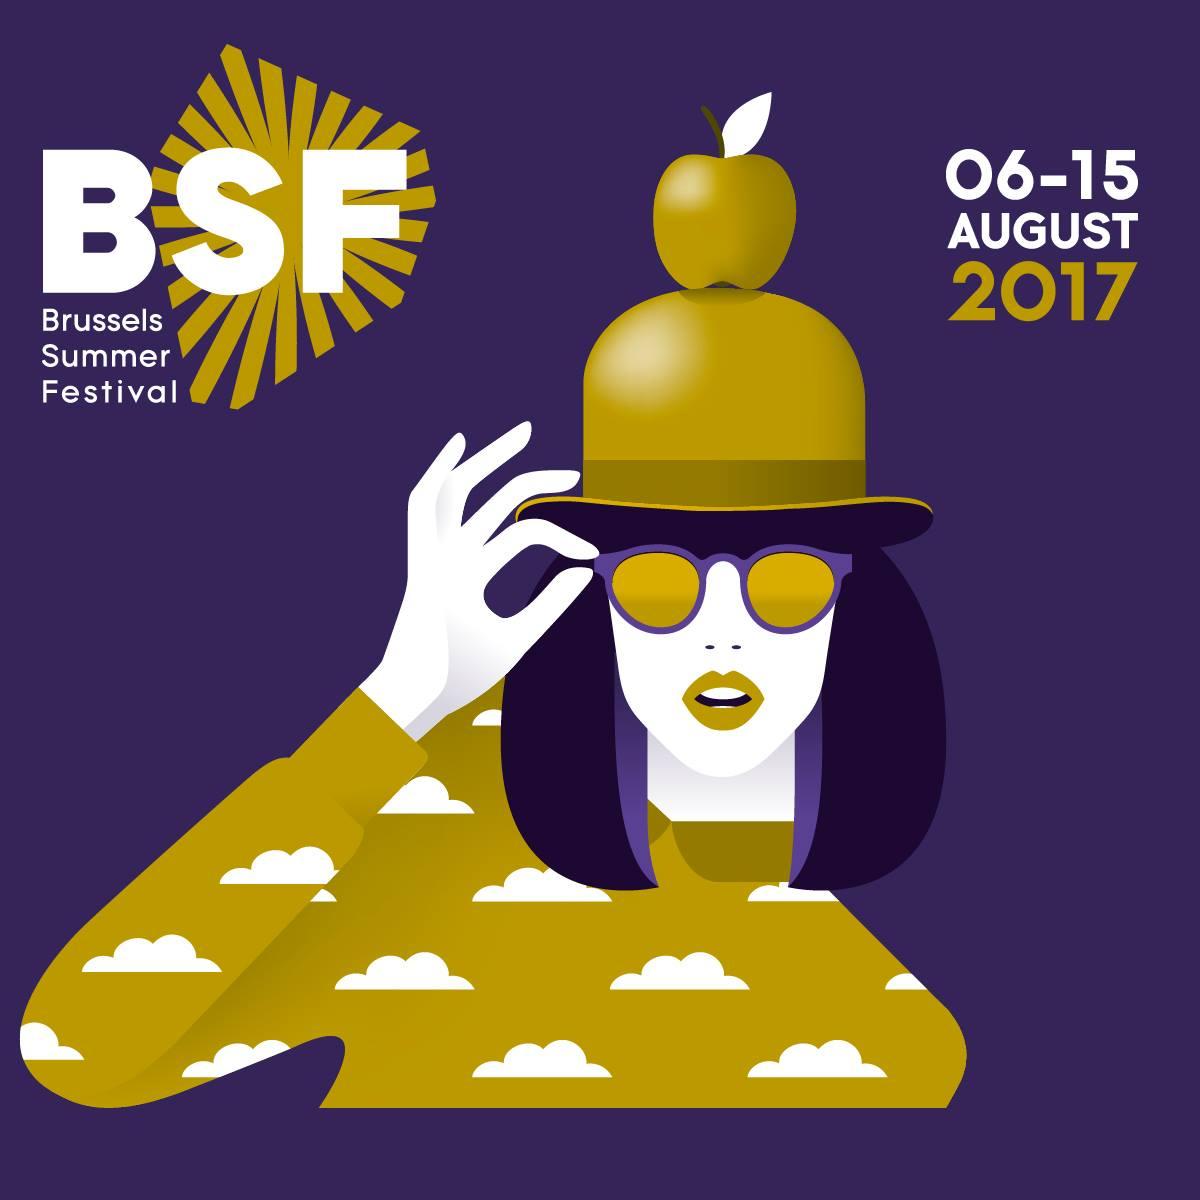 Brussels Summer Festival 2017